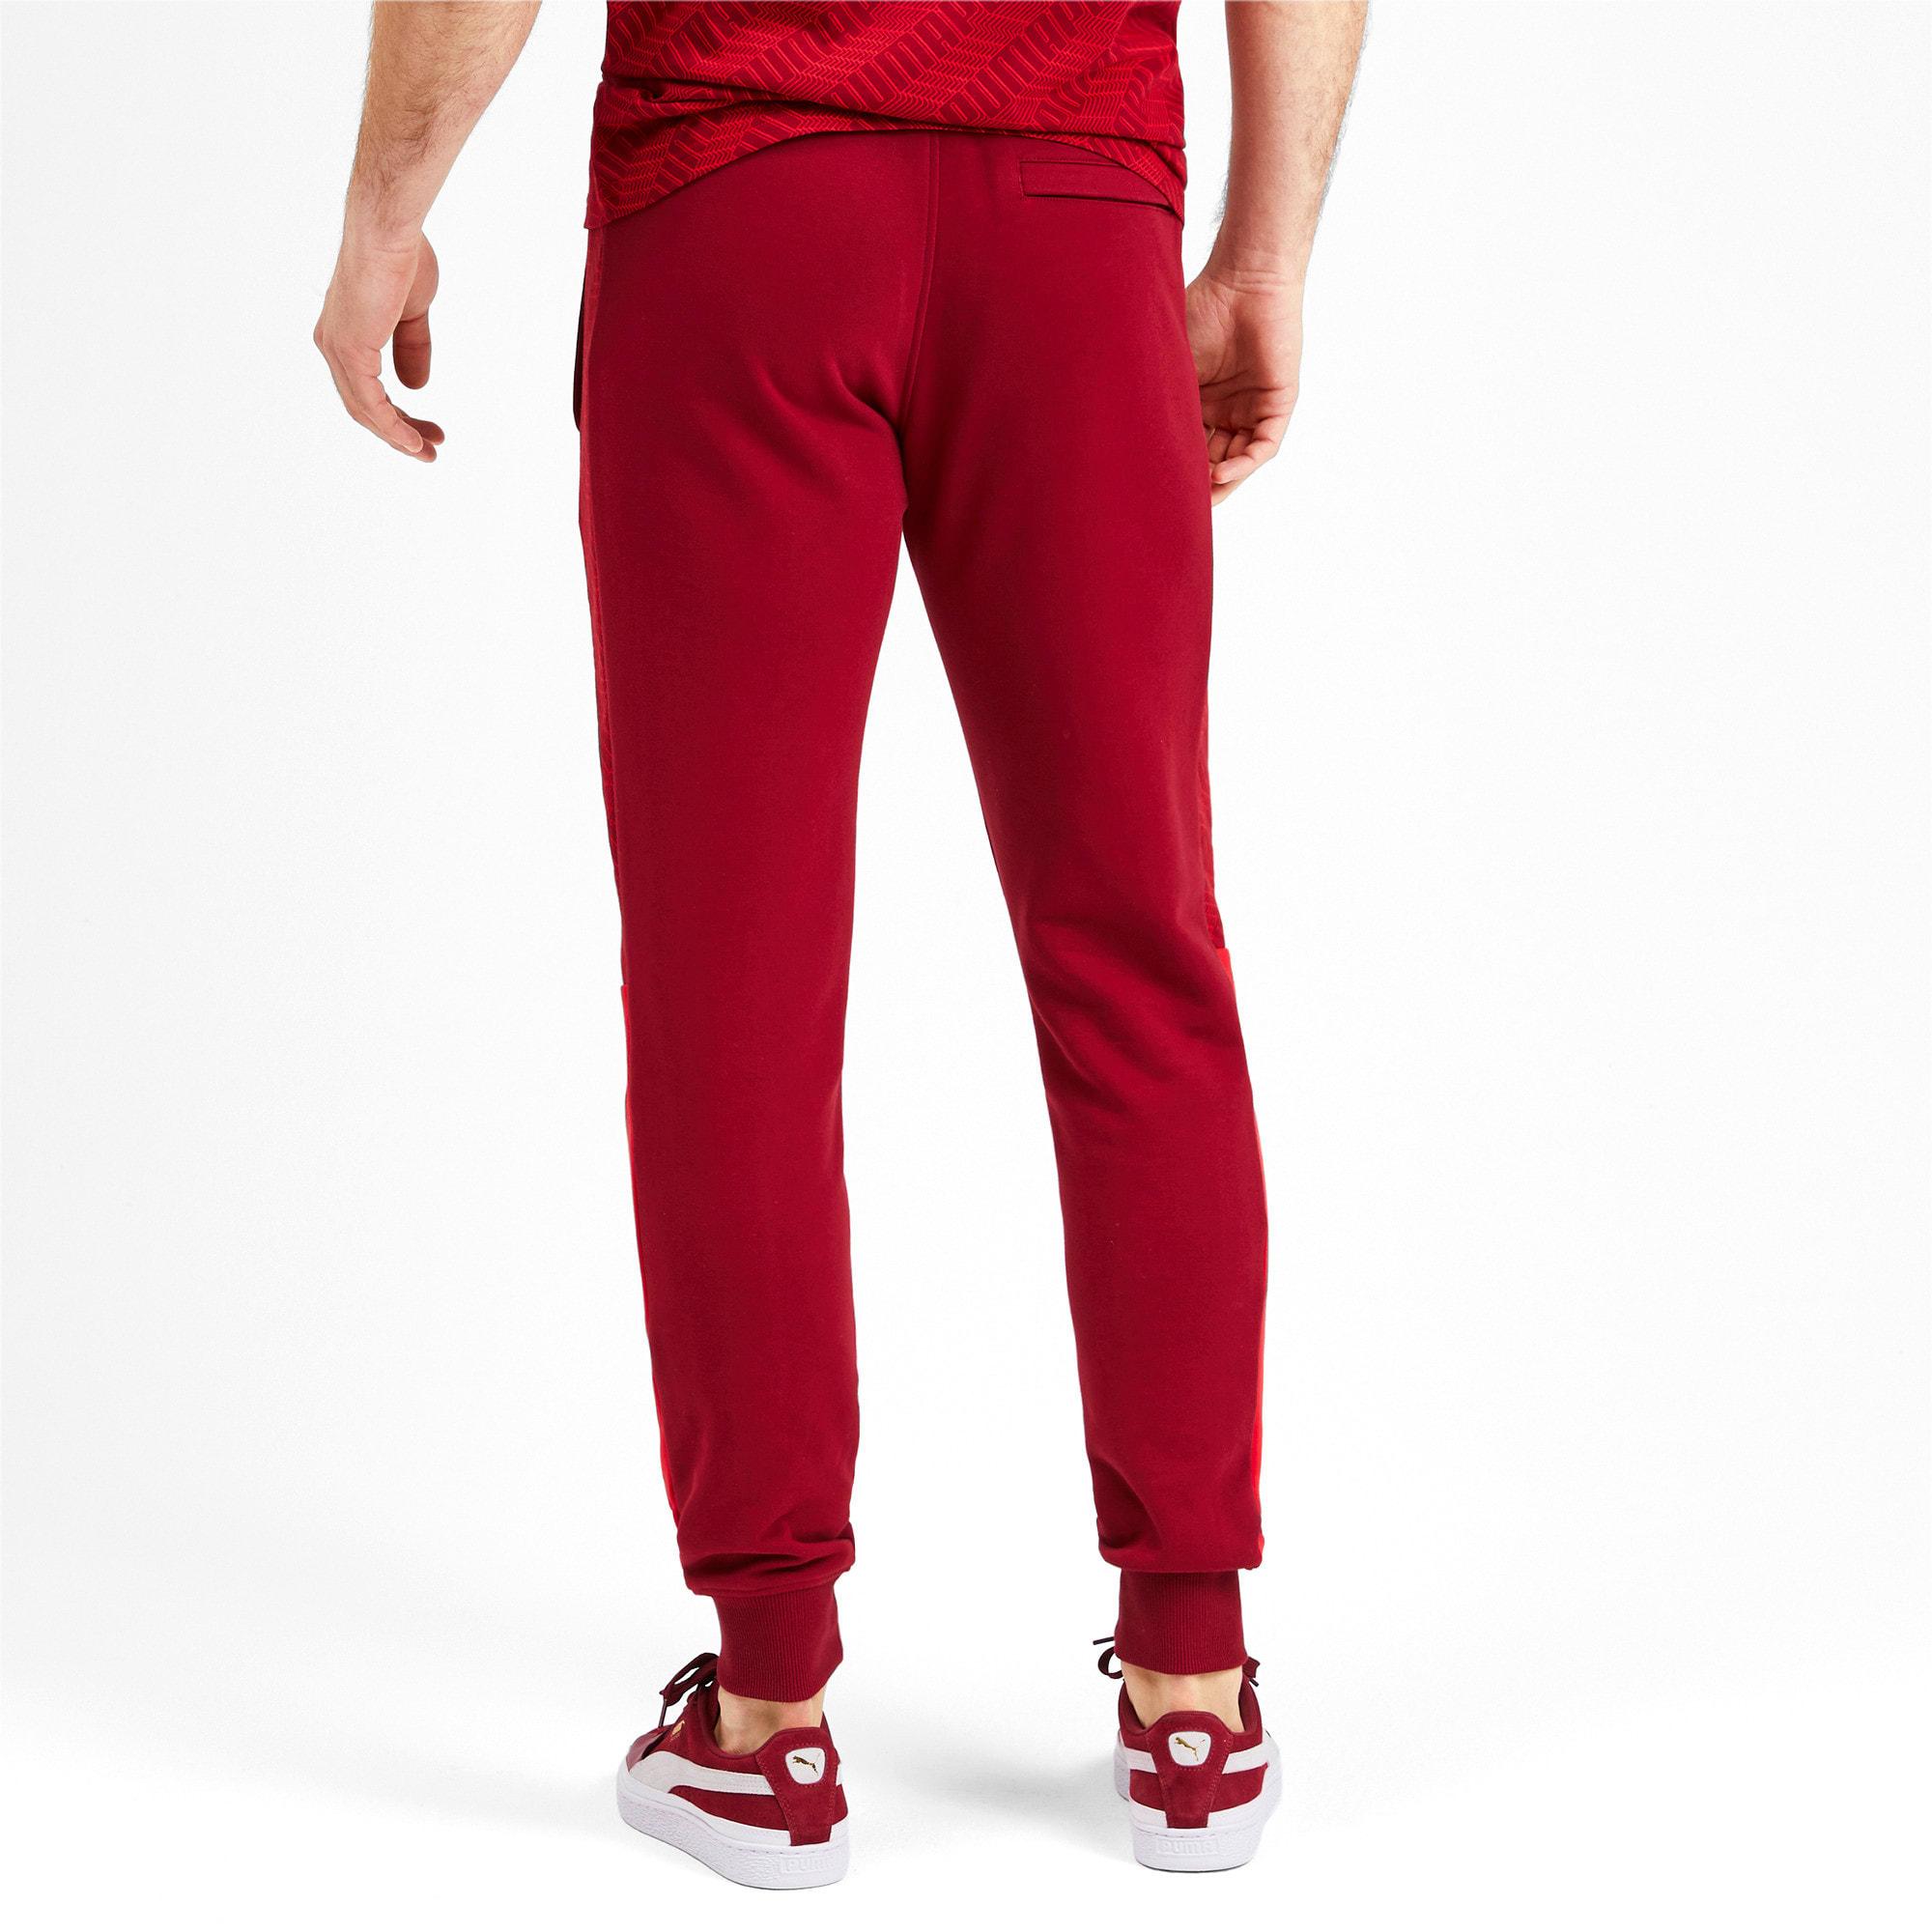 Thumbnail 3 of T7 Men's AOP Track Pants, Rhubarb-Repeat logo, medium